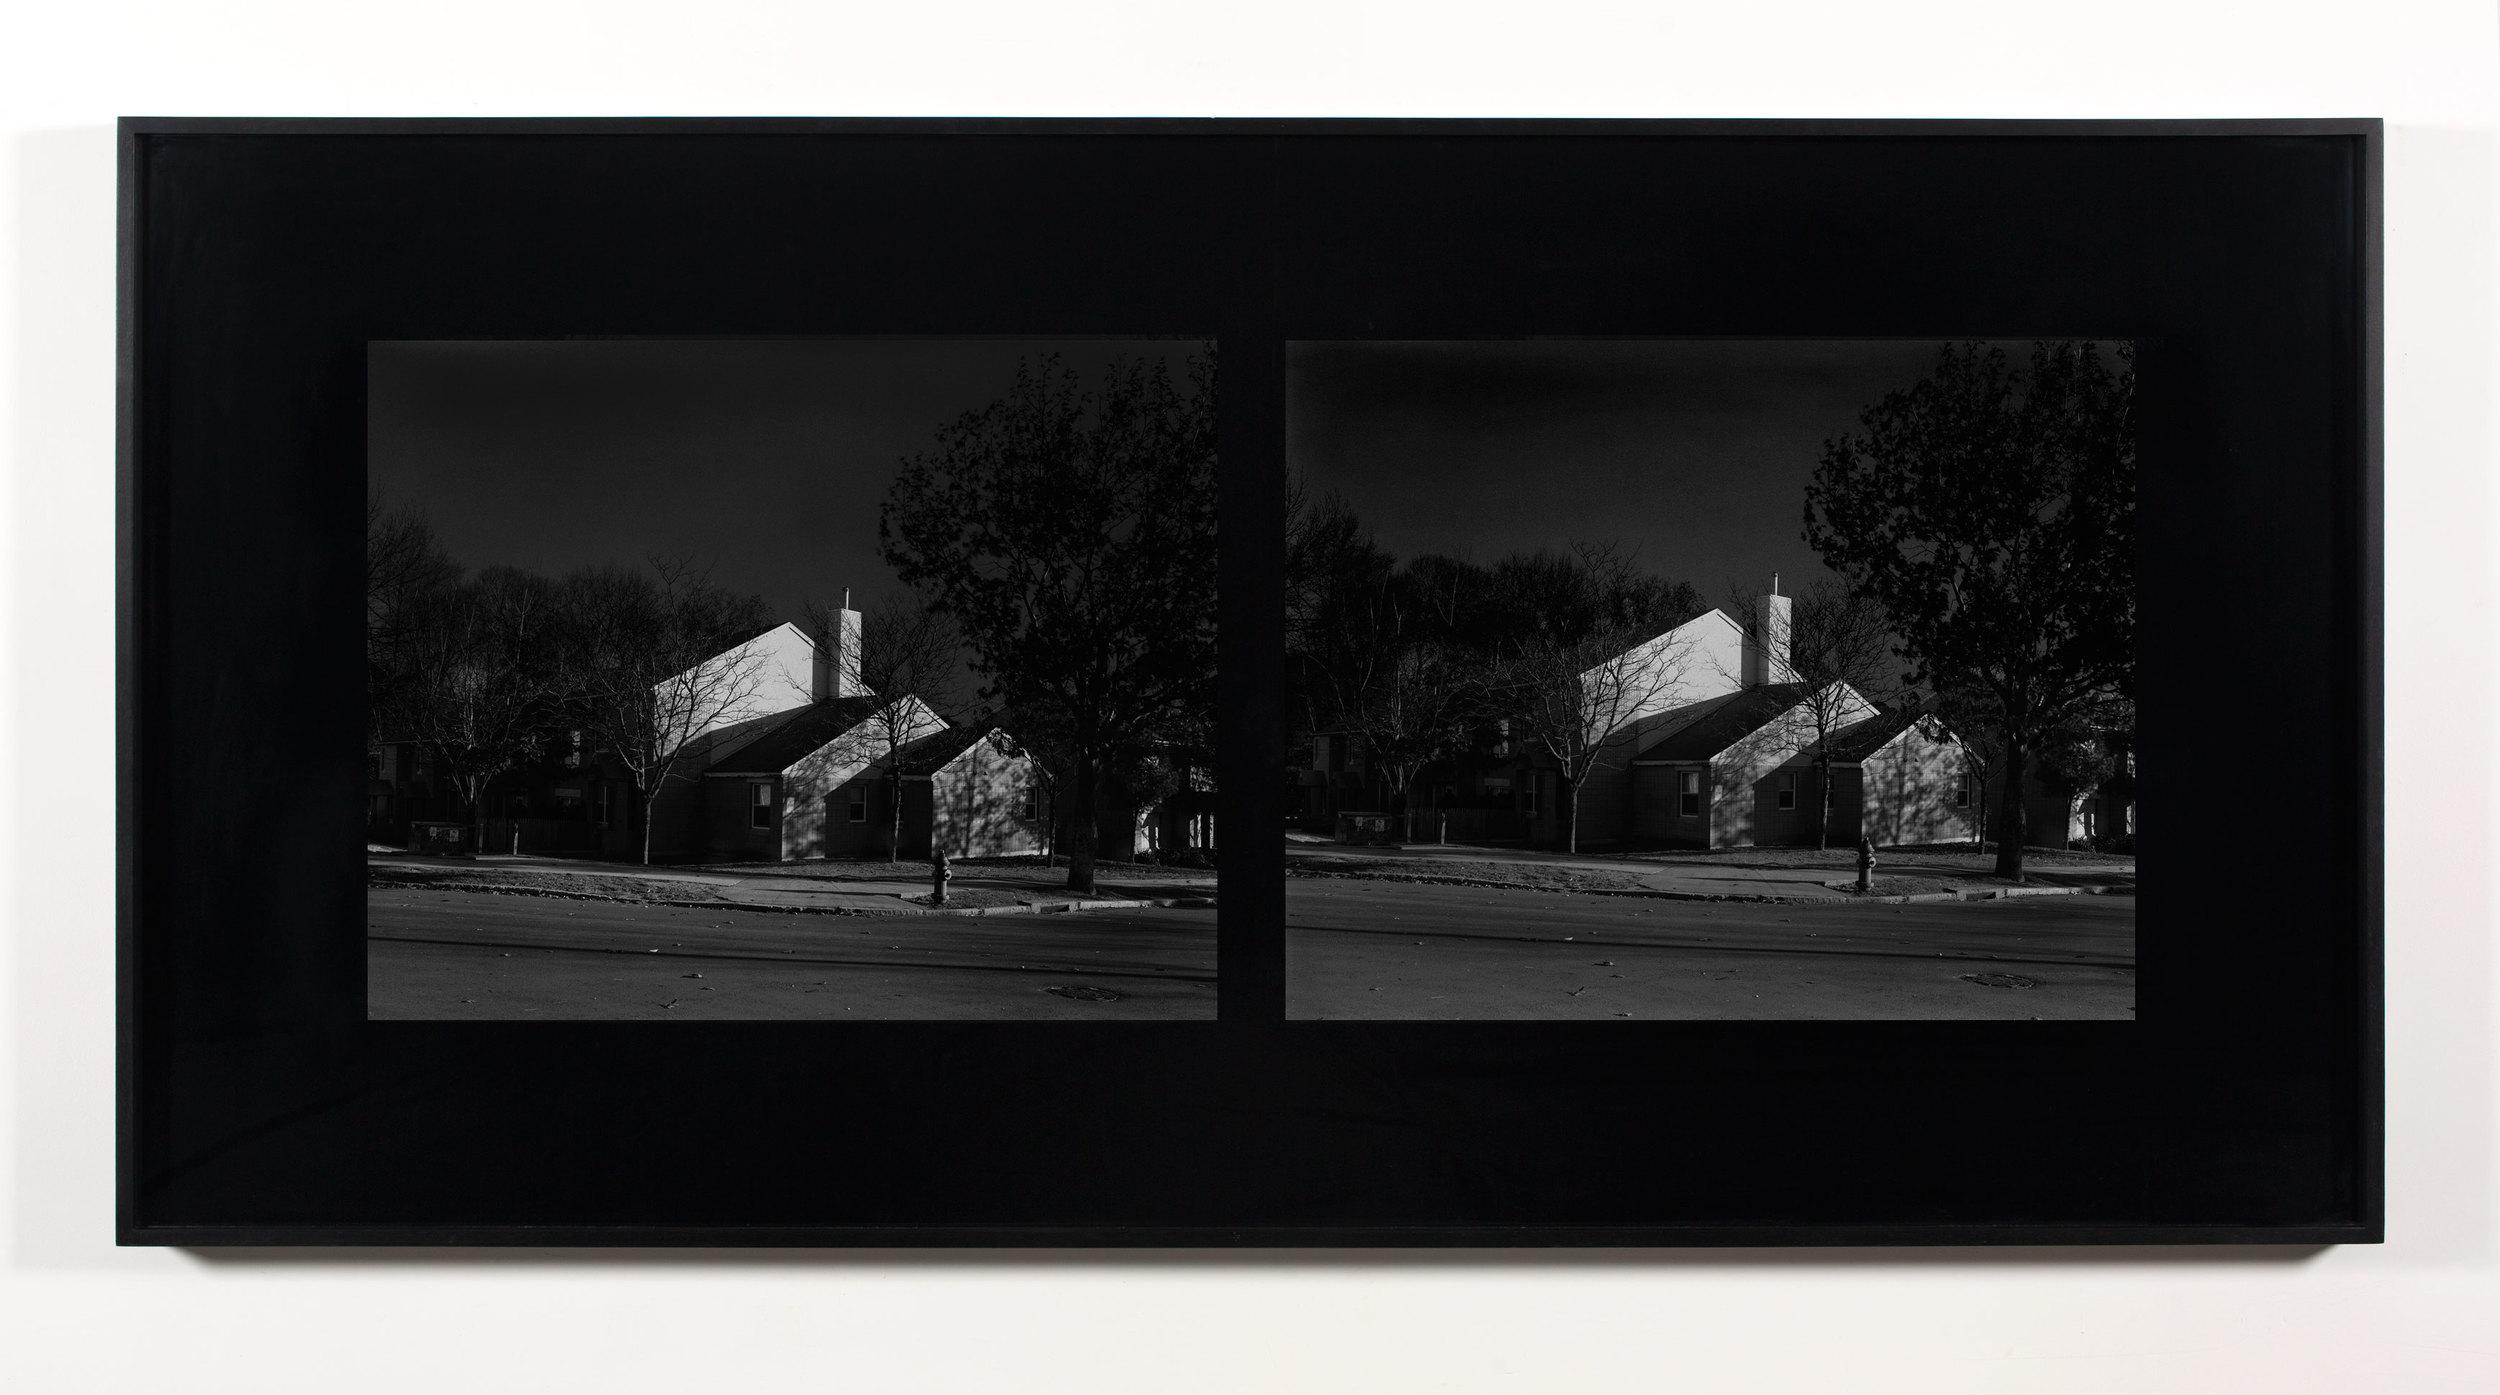 Excursionist Views (Oriental Gardens 1971, rebuilt 1983, cul-de-sac detail)    2001/2005   Chromogenic print  48 x 96 inches